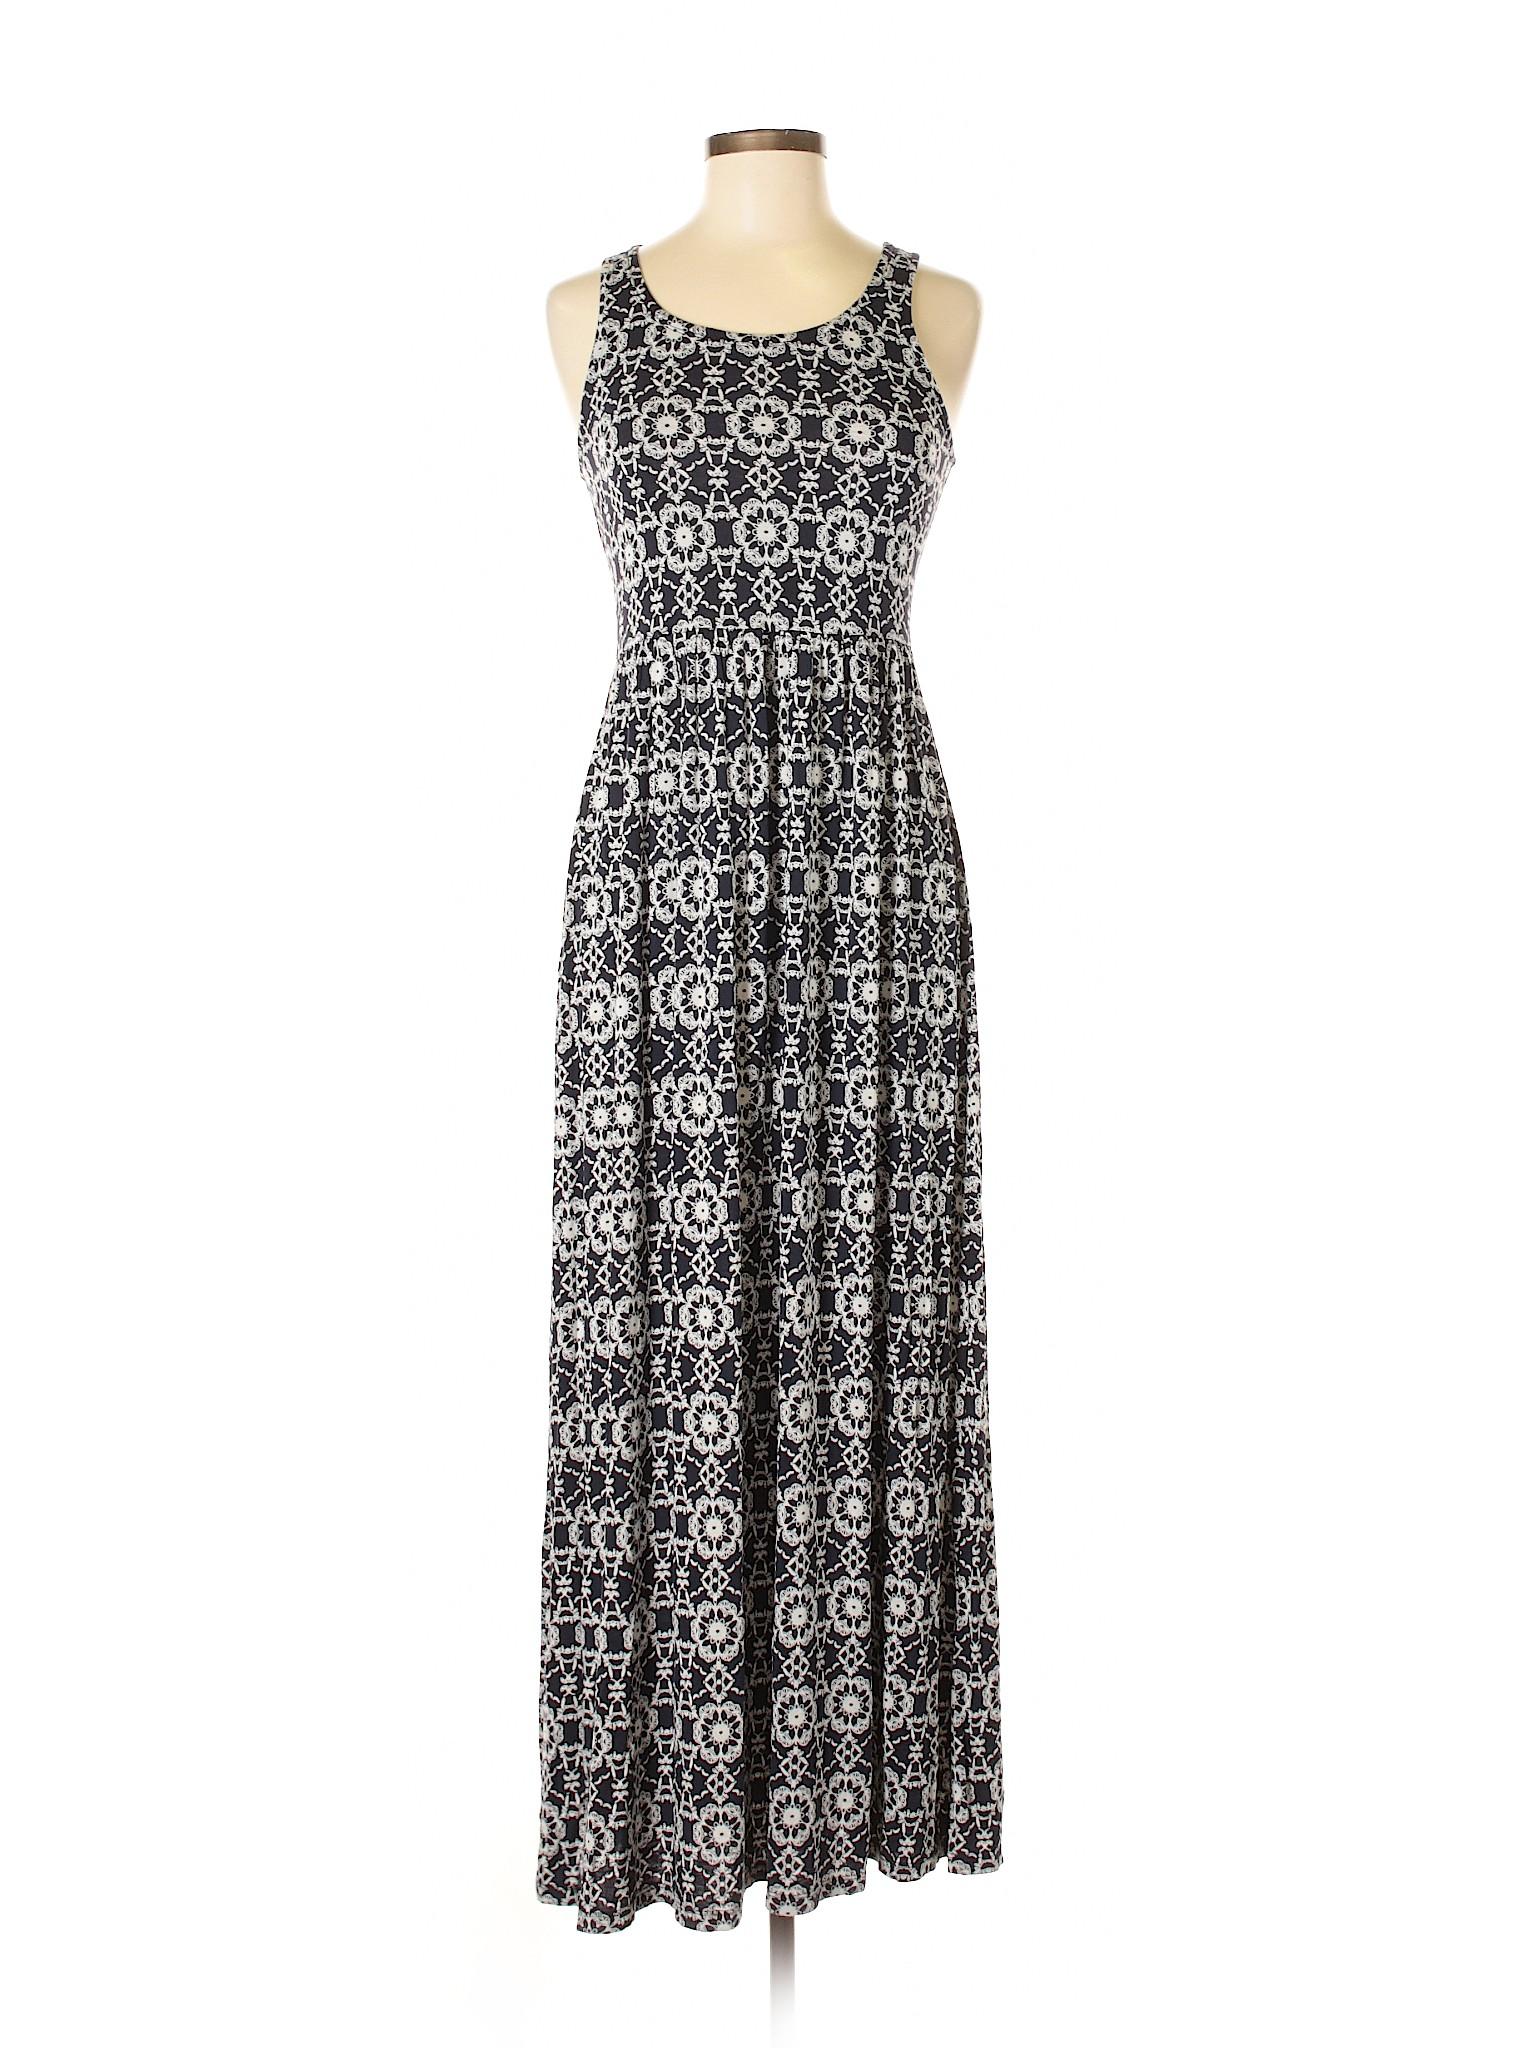 Taylor Casual Selling Dress Ann LOFT x5qawatBY